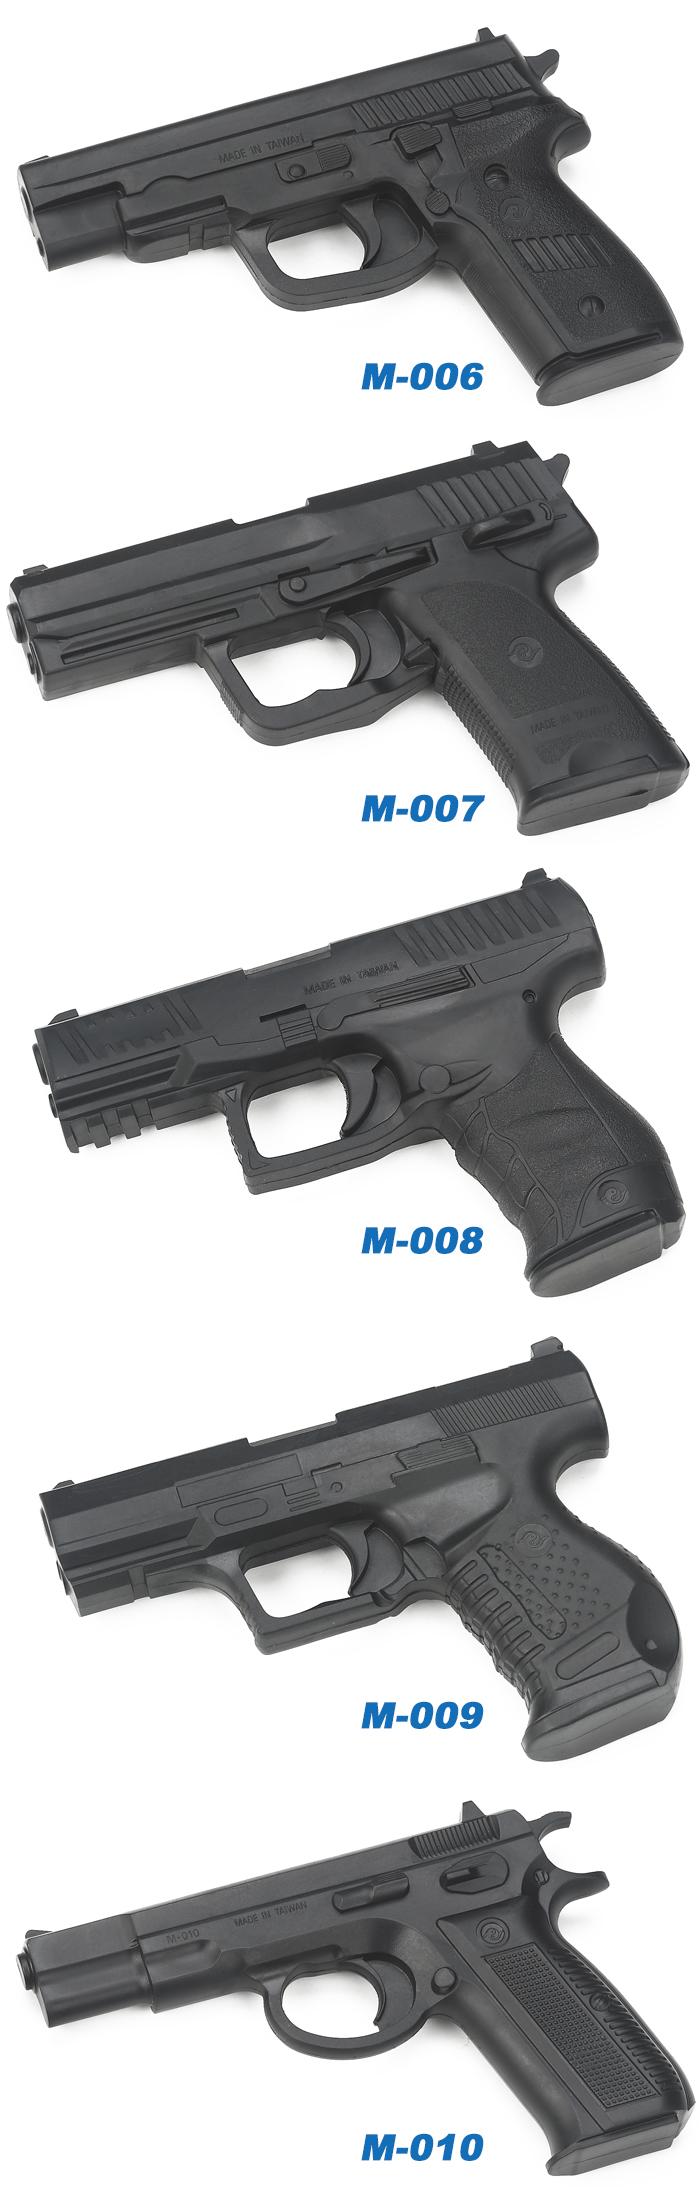 Taiwan TP RUBBER TRAINING GUN - HK USP CONTACT | INDICIA